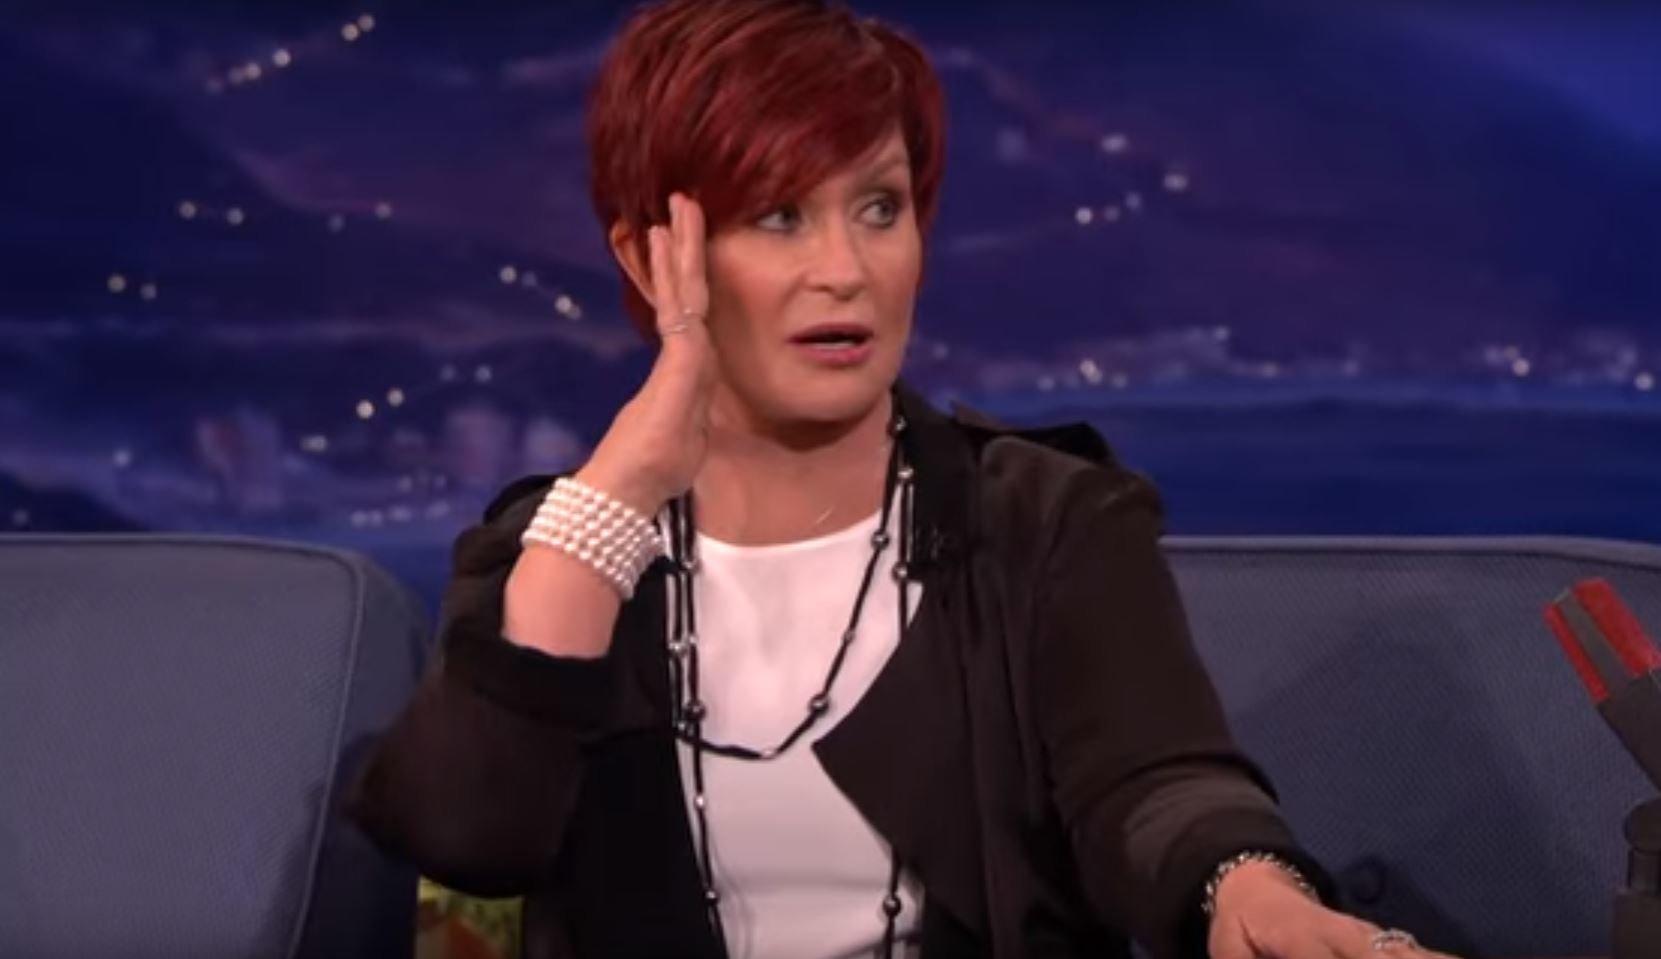 Sharon Osbourne slated 'The X Factor' in a 2014